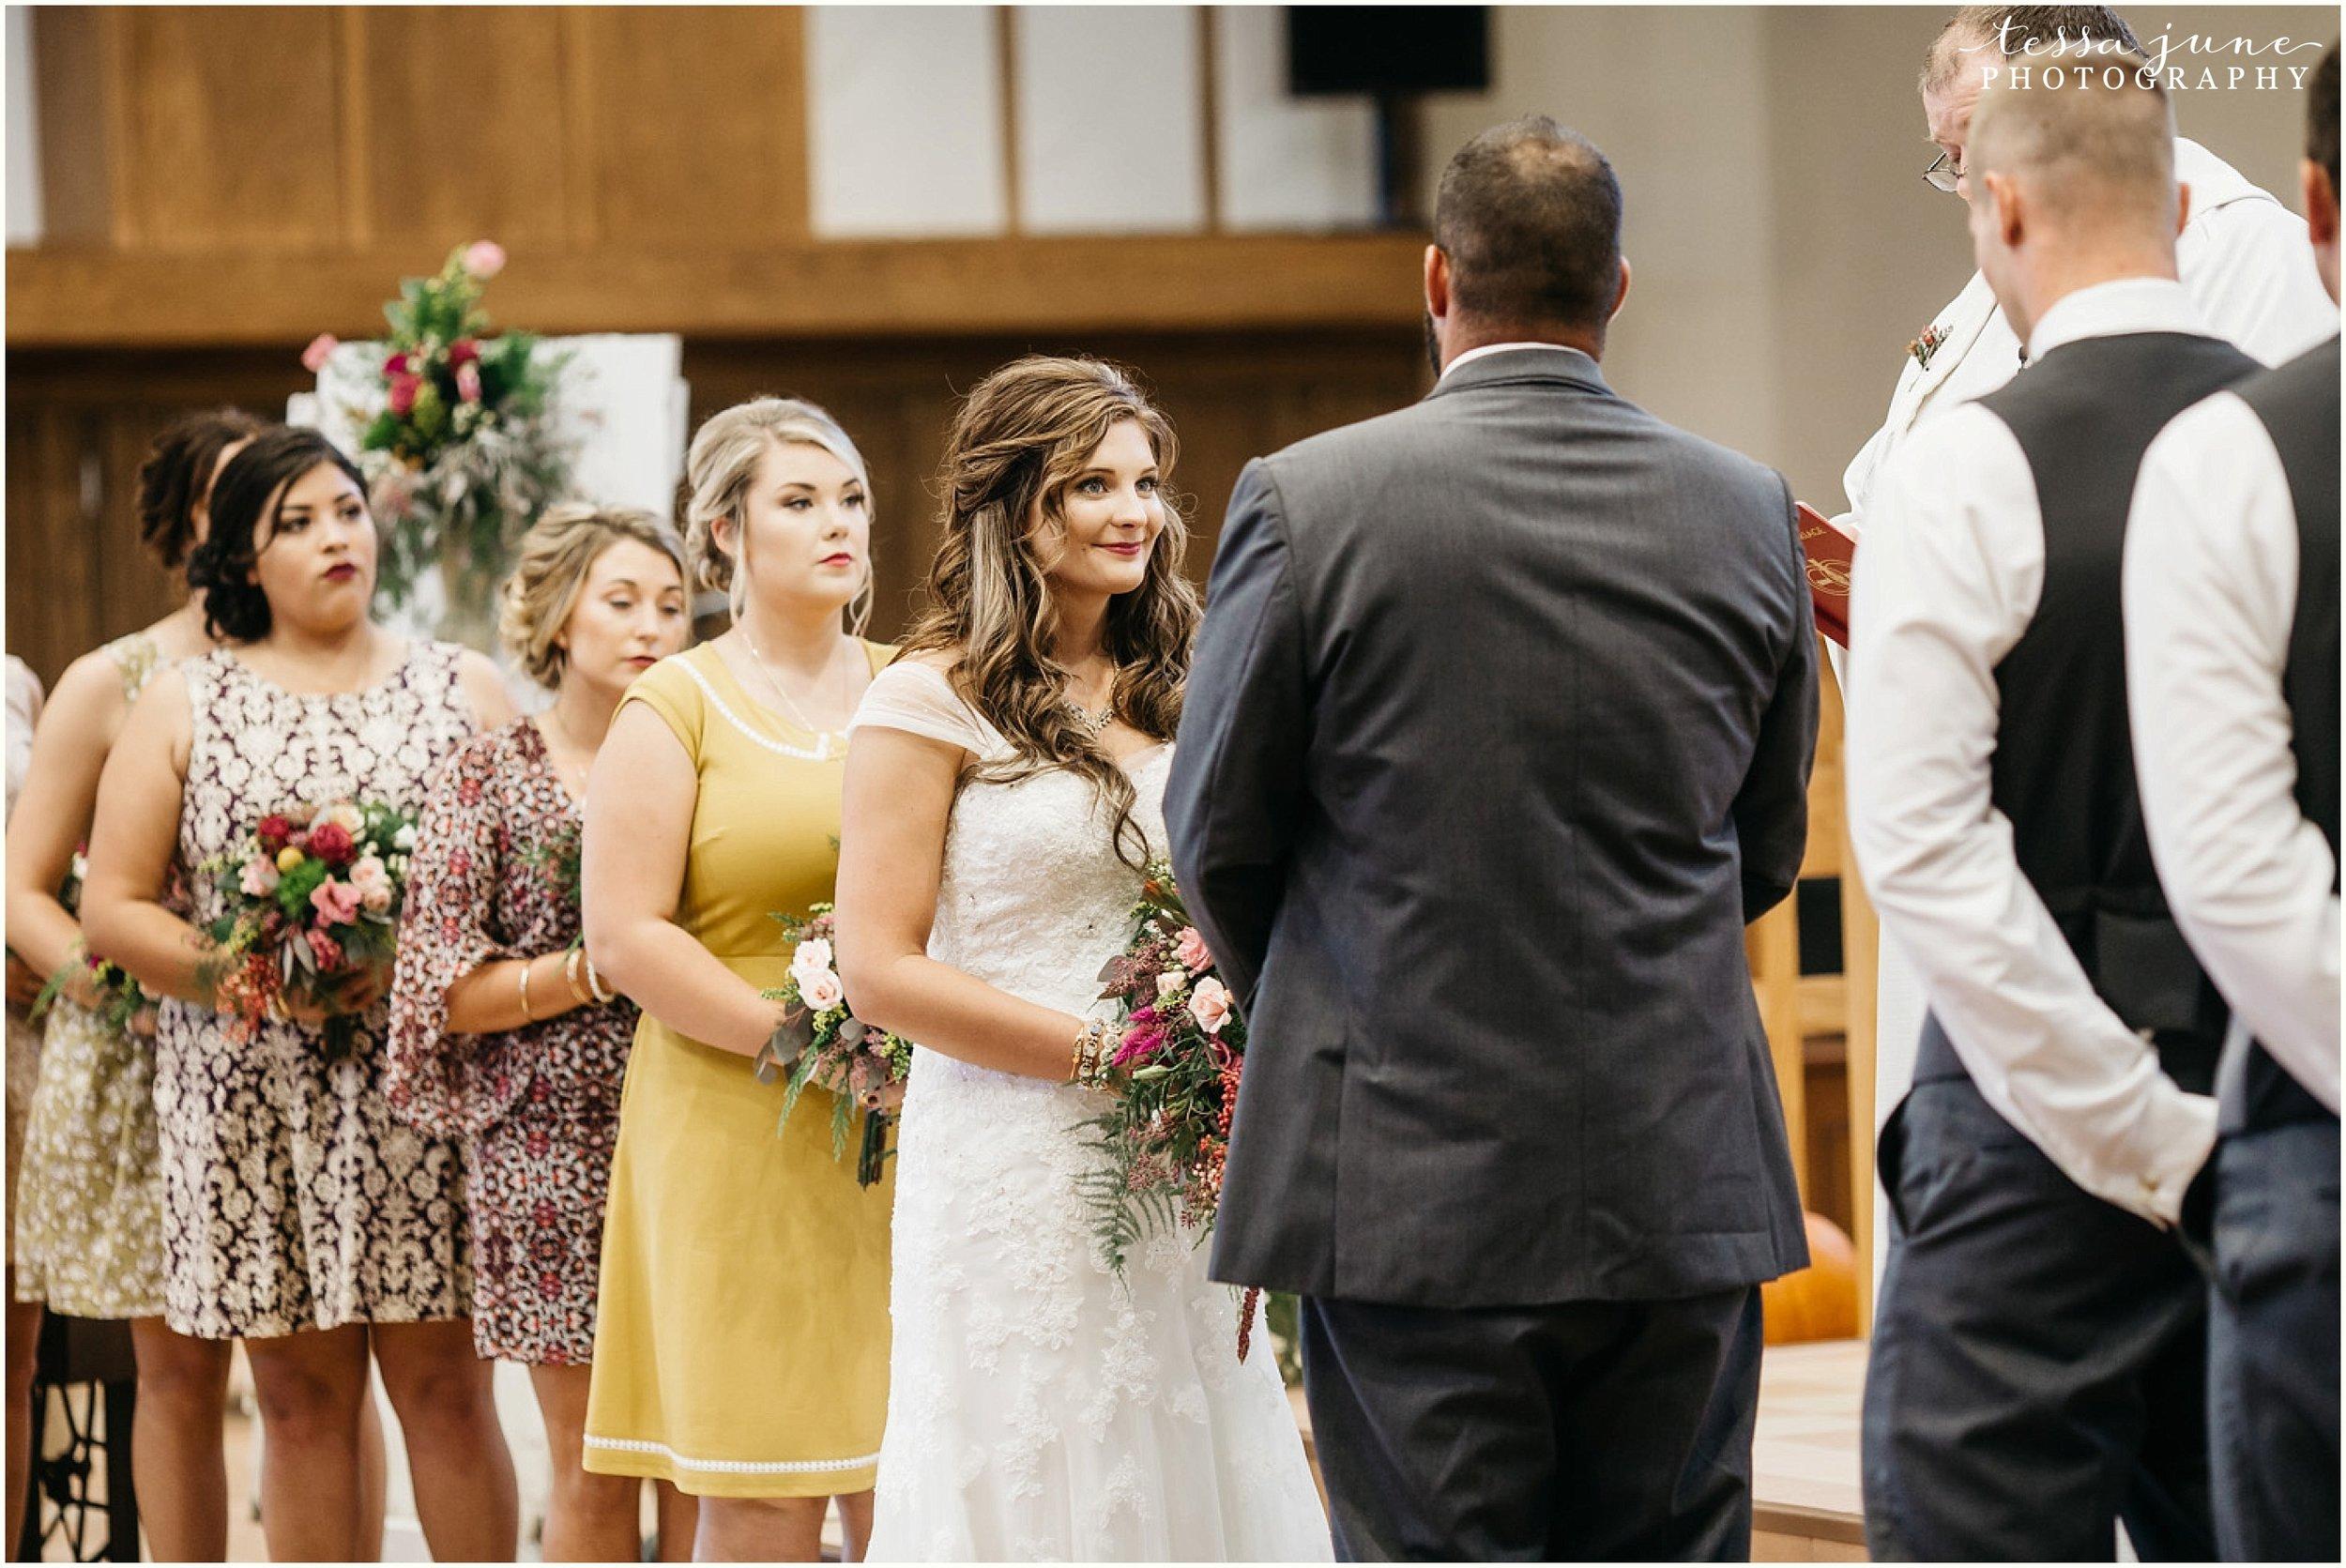 bohemian-minnesota-wedding-mismatched-bridesmaid-dresses-waterfall-st-cloud-tessa-june-photography-108.jpg